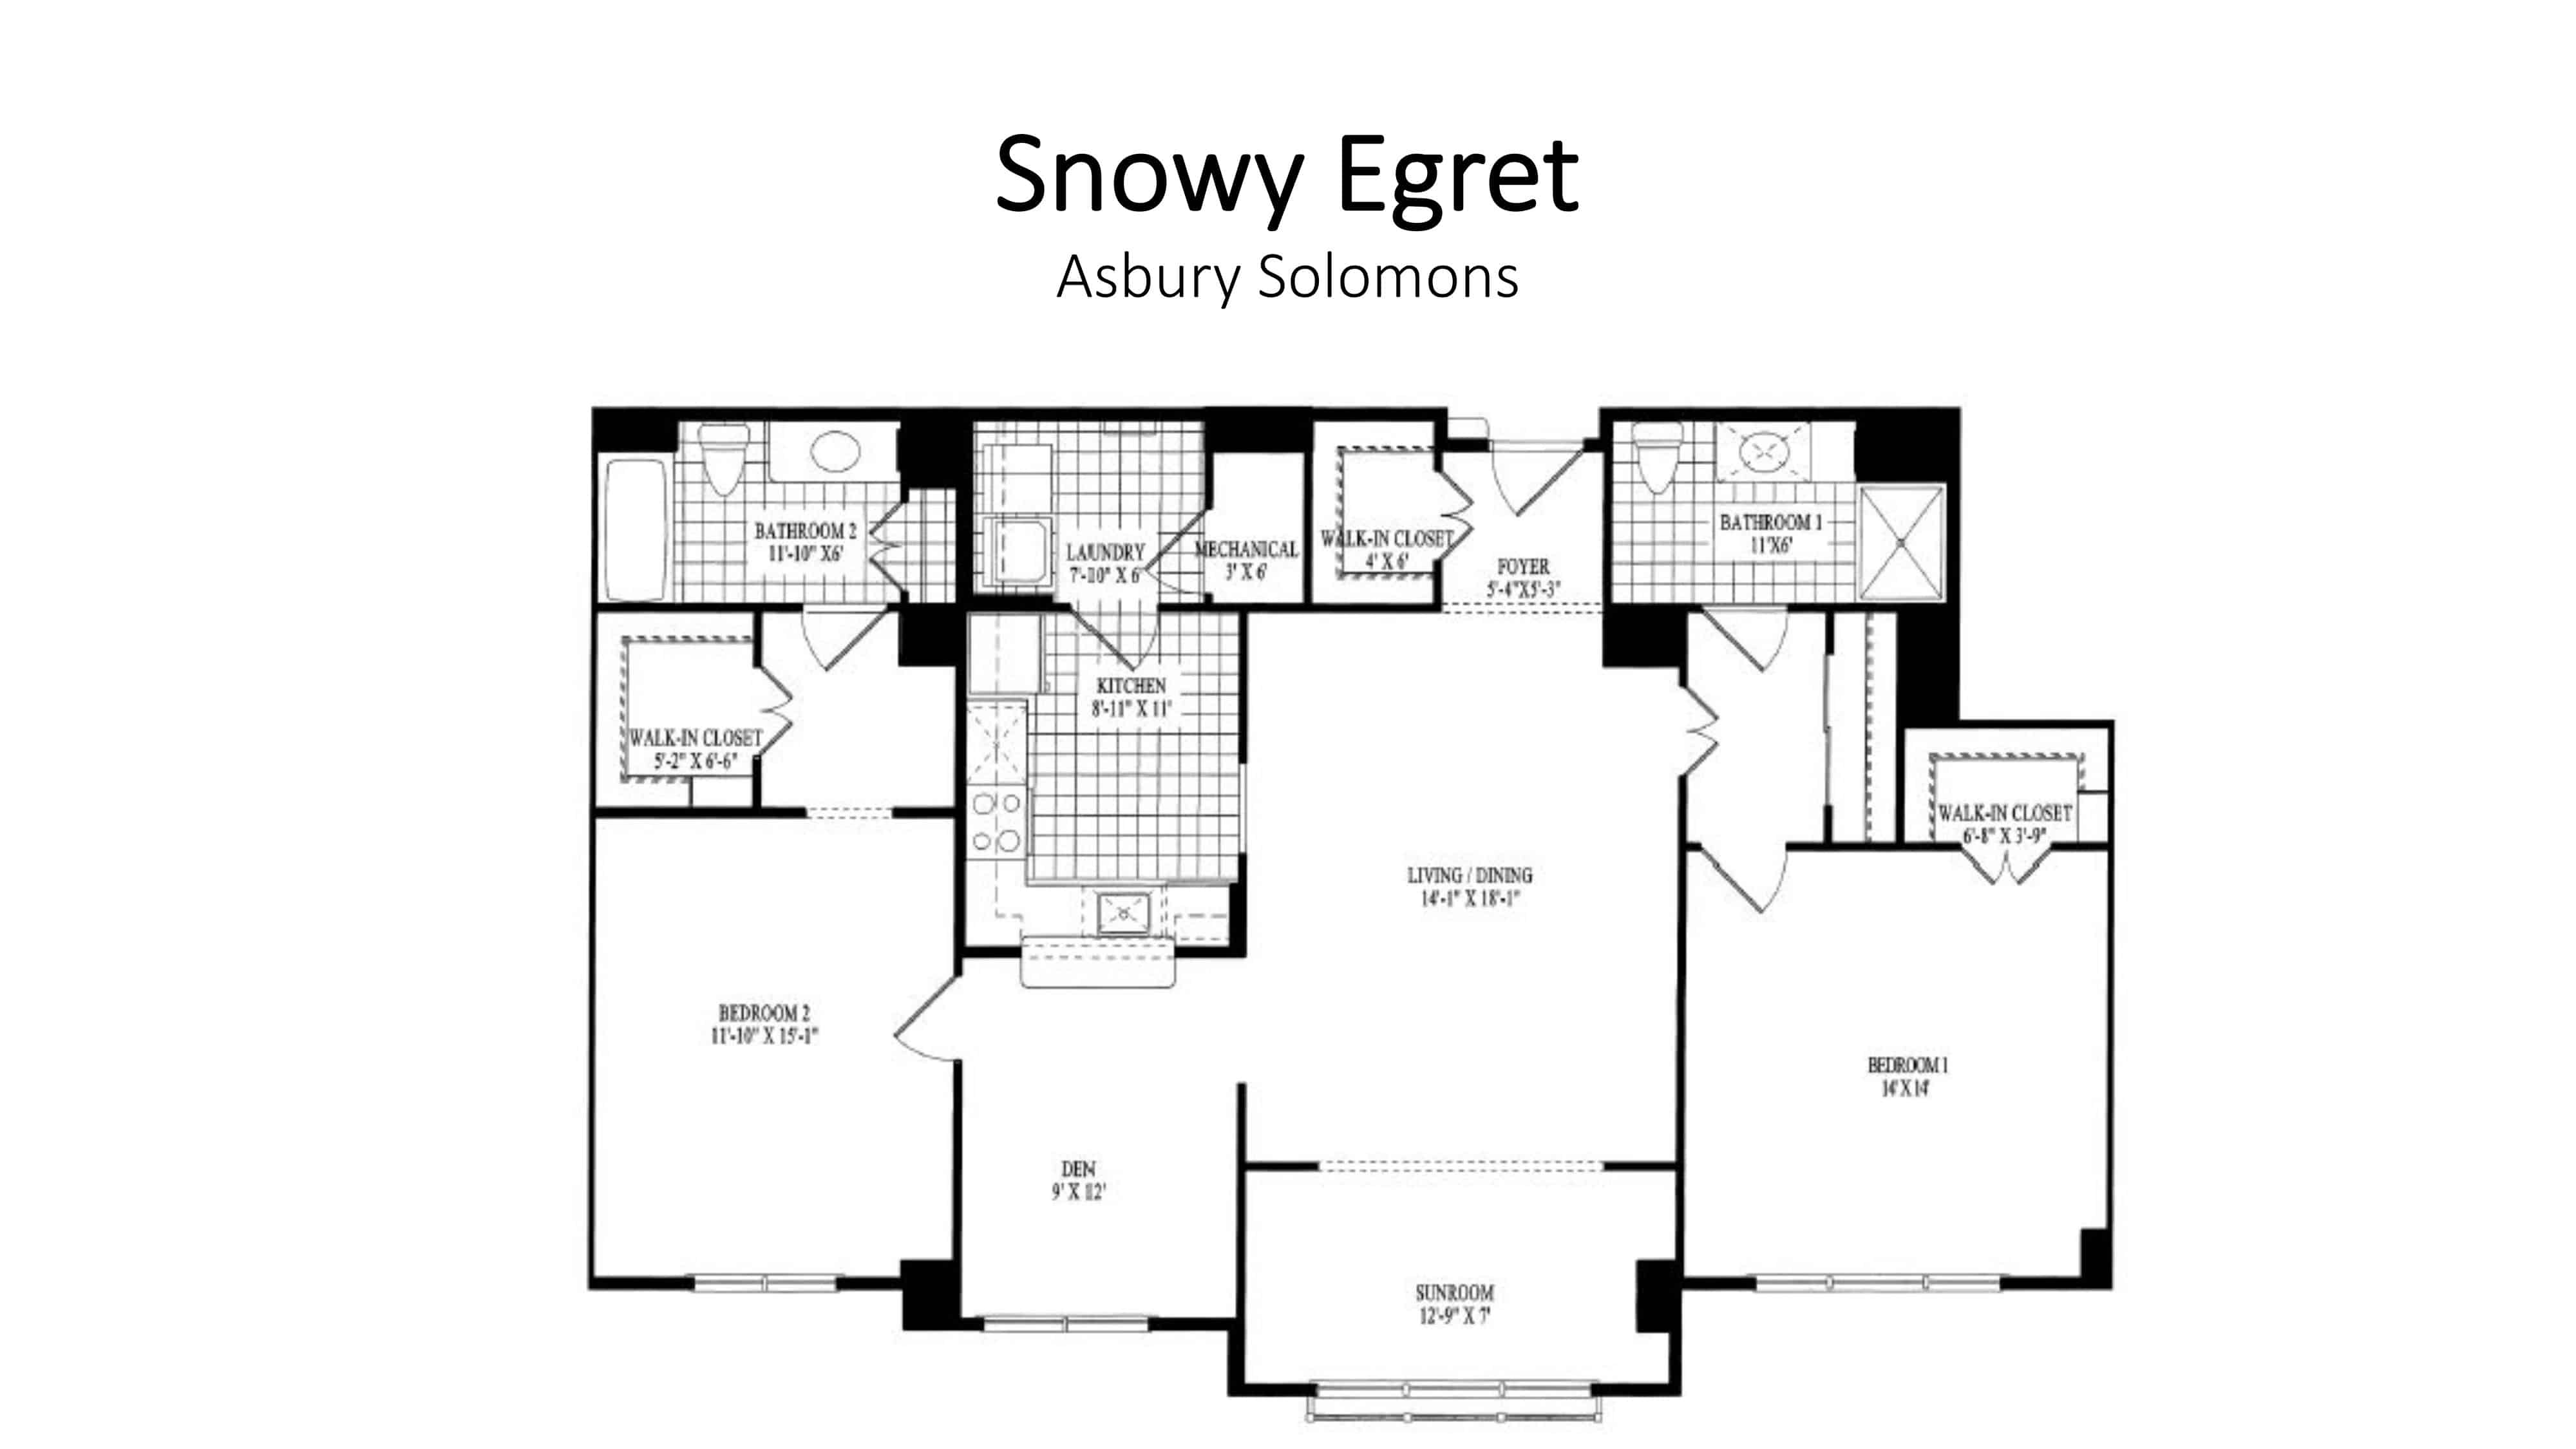 AS_Snowy_Egret